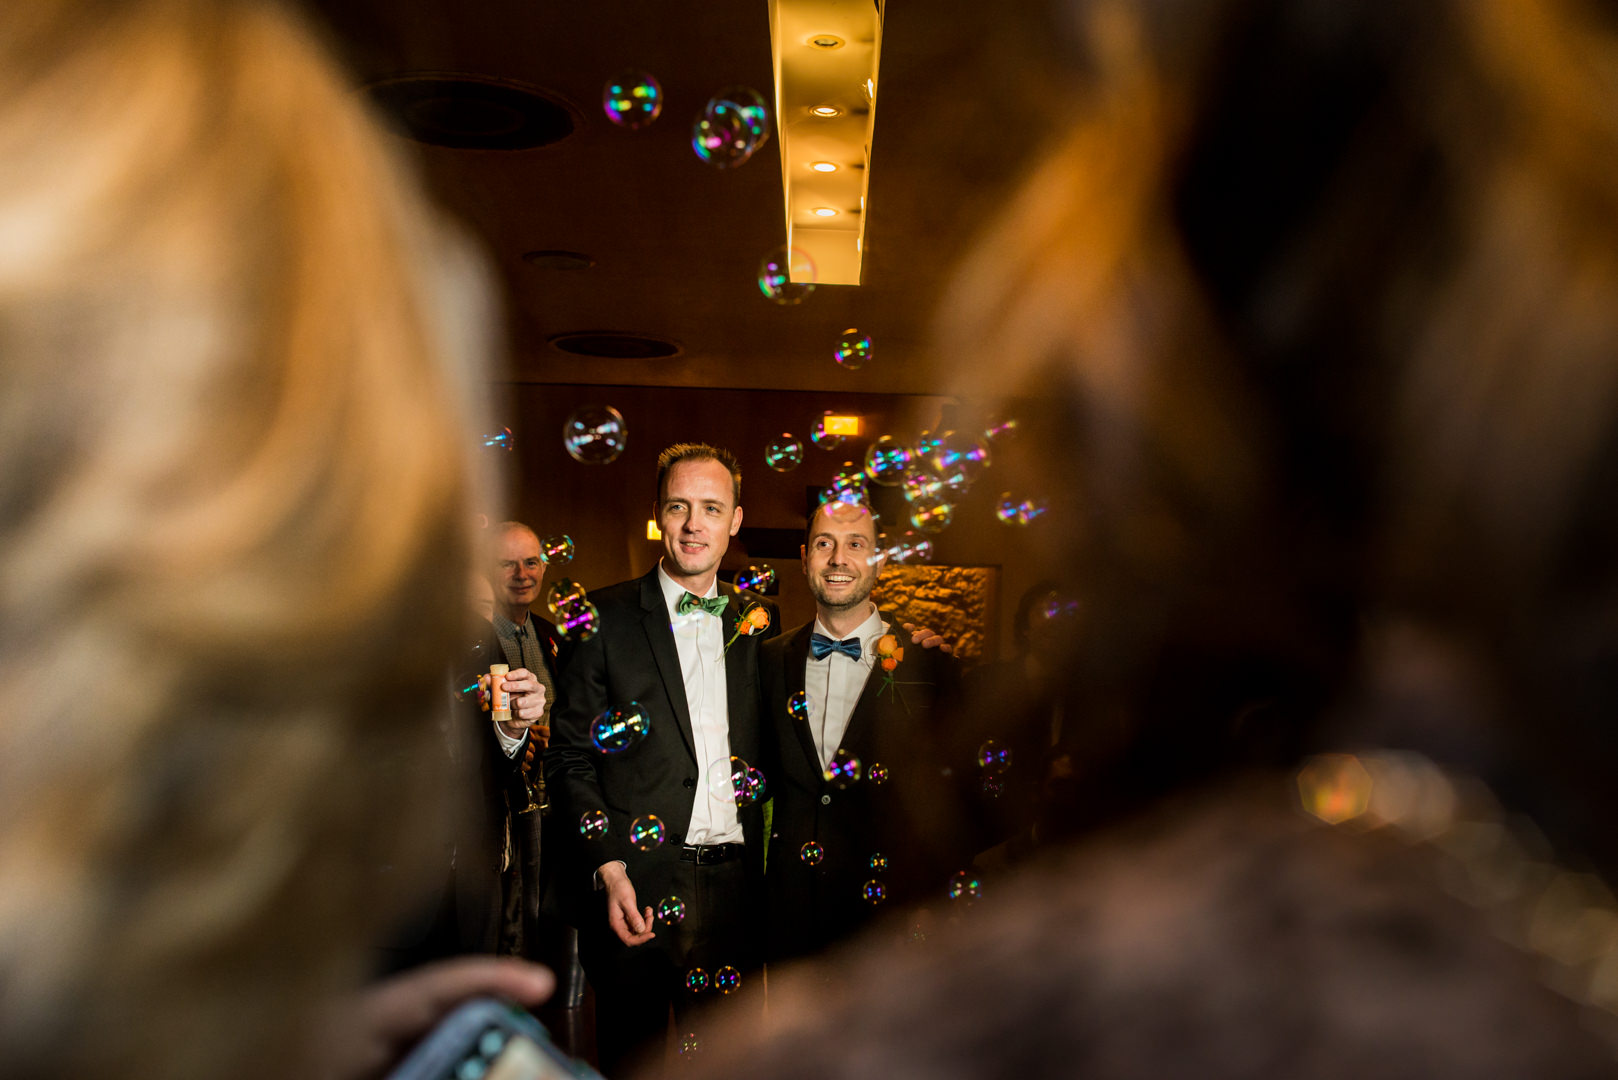 Same-sex-wedding-barcelona-boda- gay-samesex-engagement-Rafael-Torres-fotografo-bodas-sevilla-madrid-barcelona-wedding-photographer--37.jpg